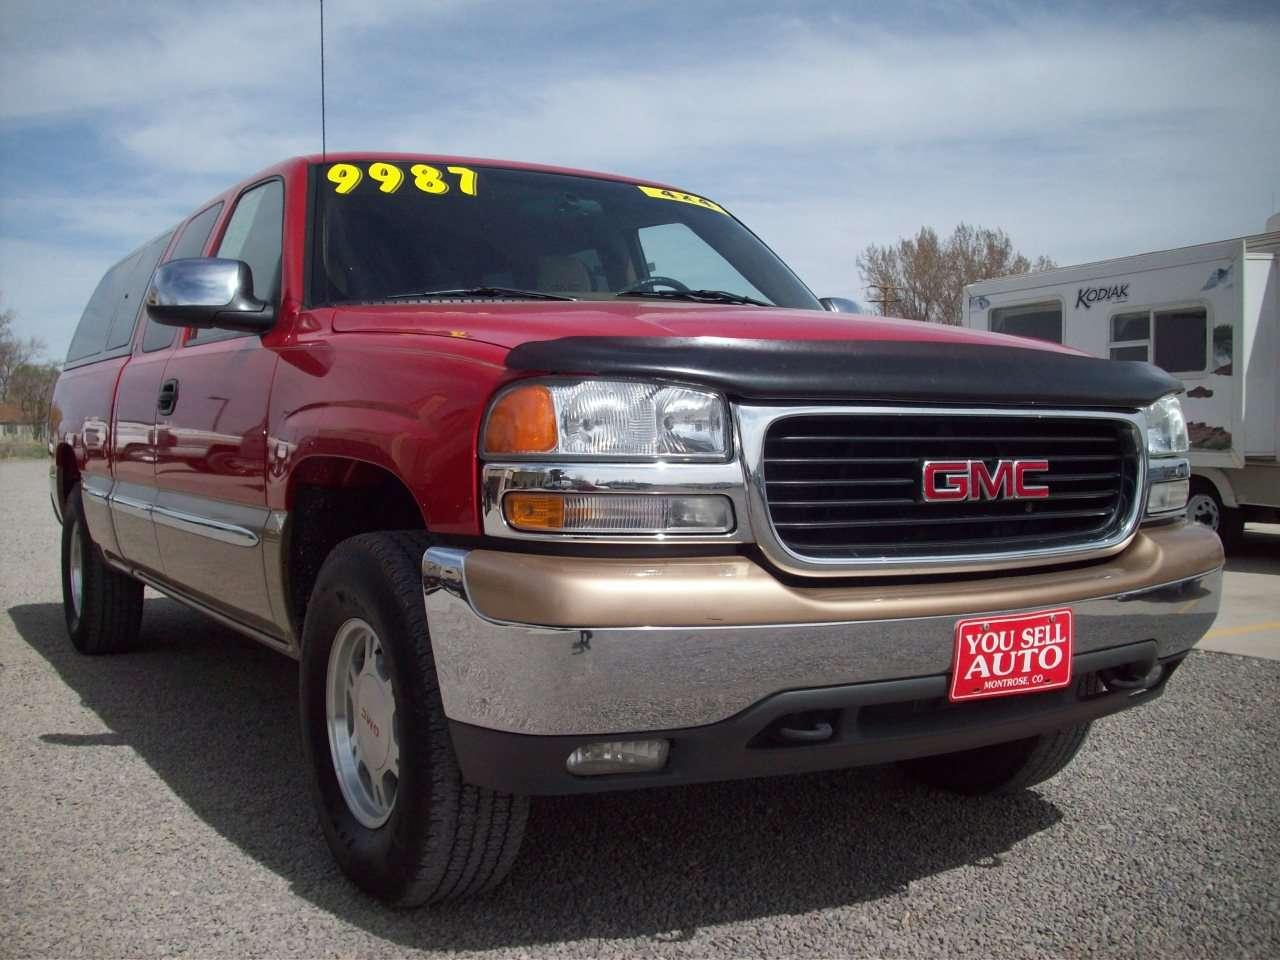 1999 Gmc Sierra 1500 Slt 4x4 Truck Sold You Sell Auto